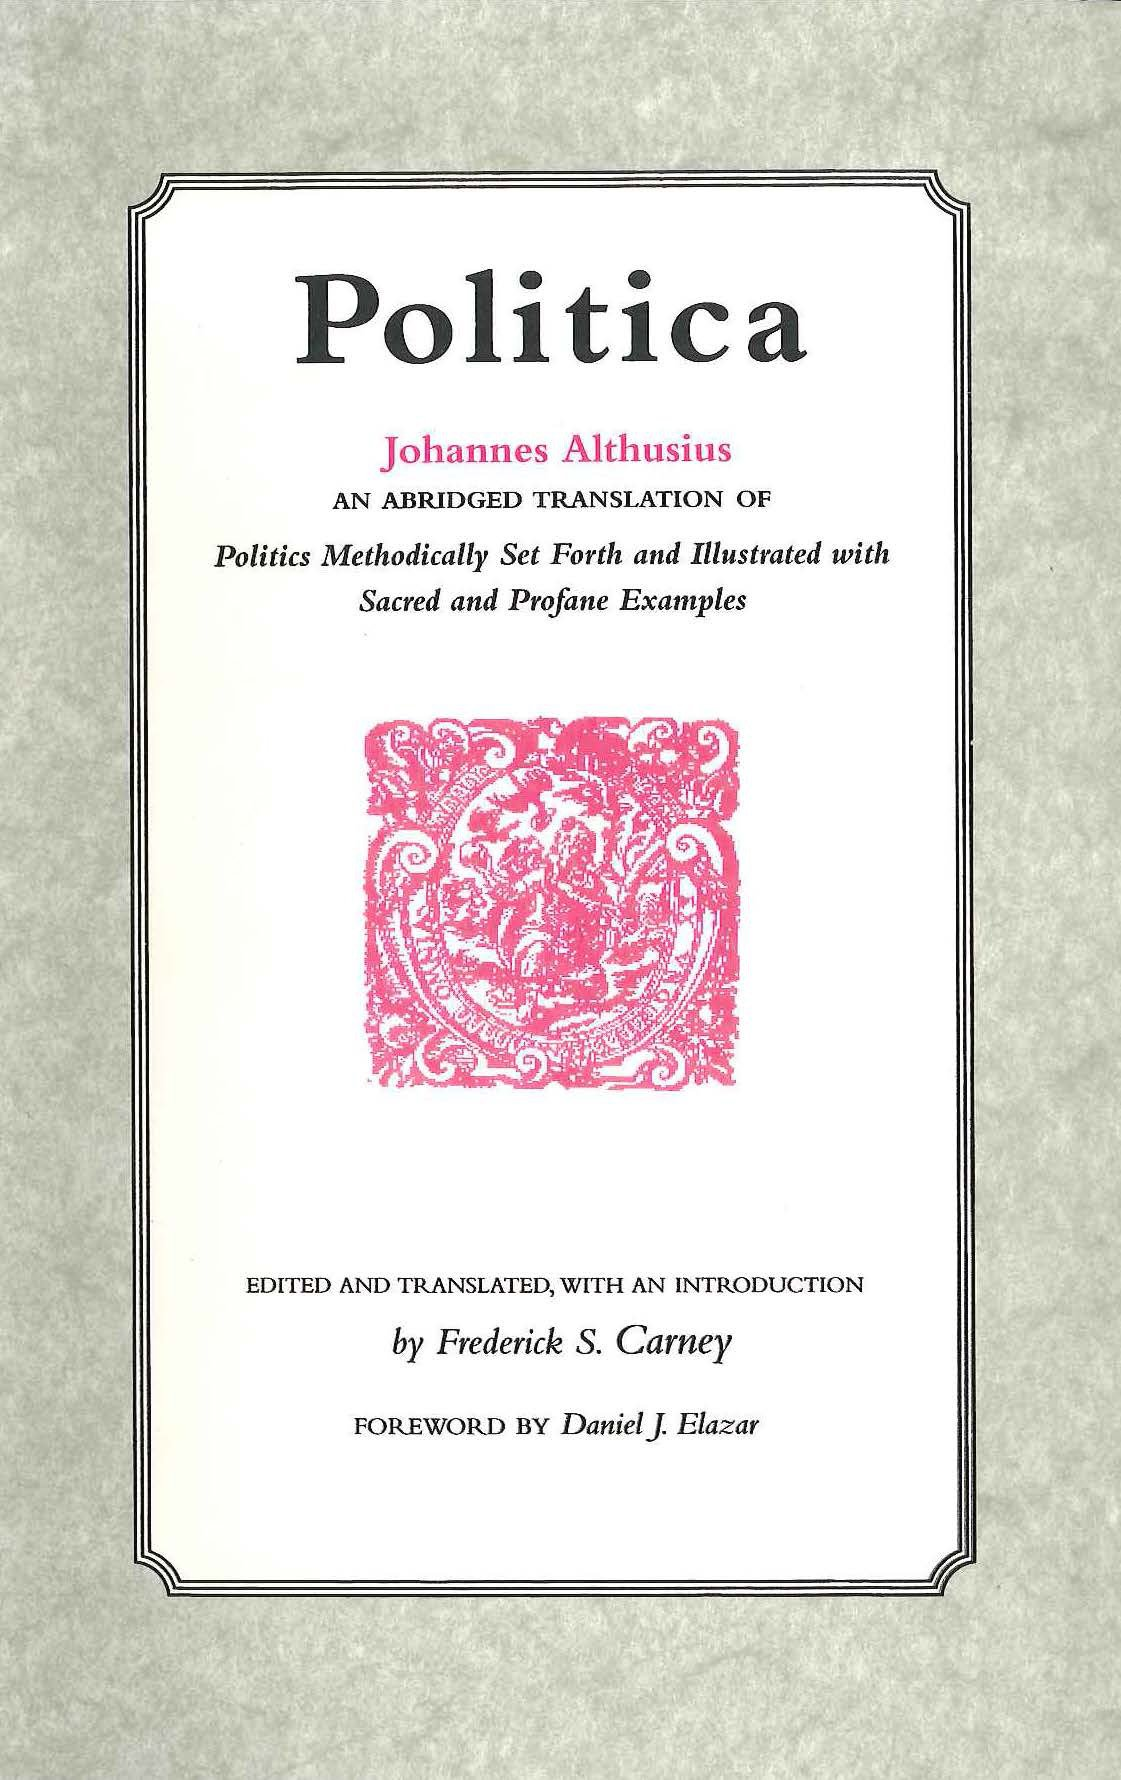 Reflections on mircea eliade's the sacred and the profane | don.